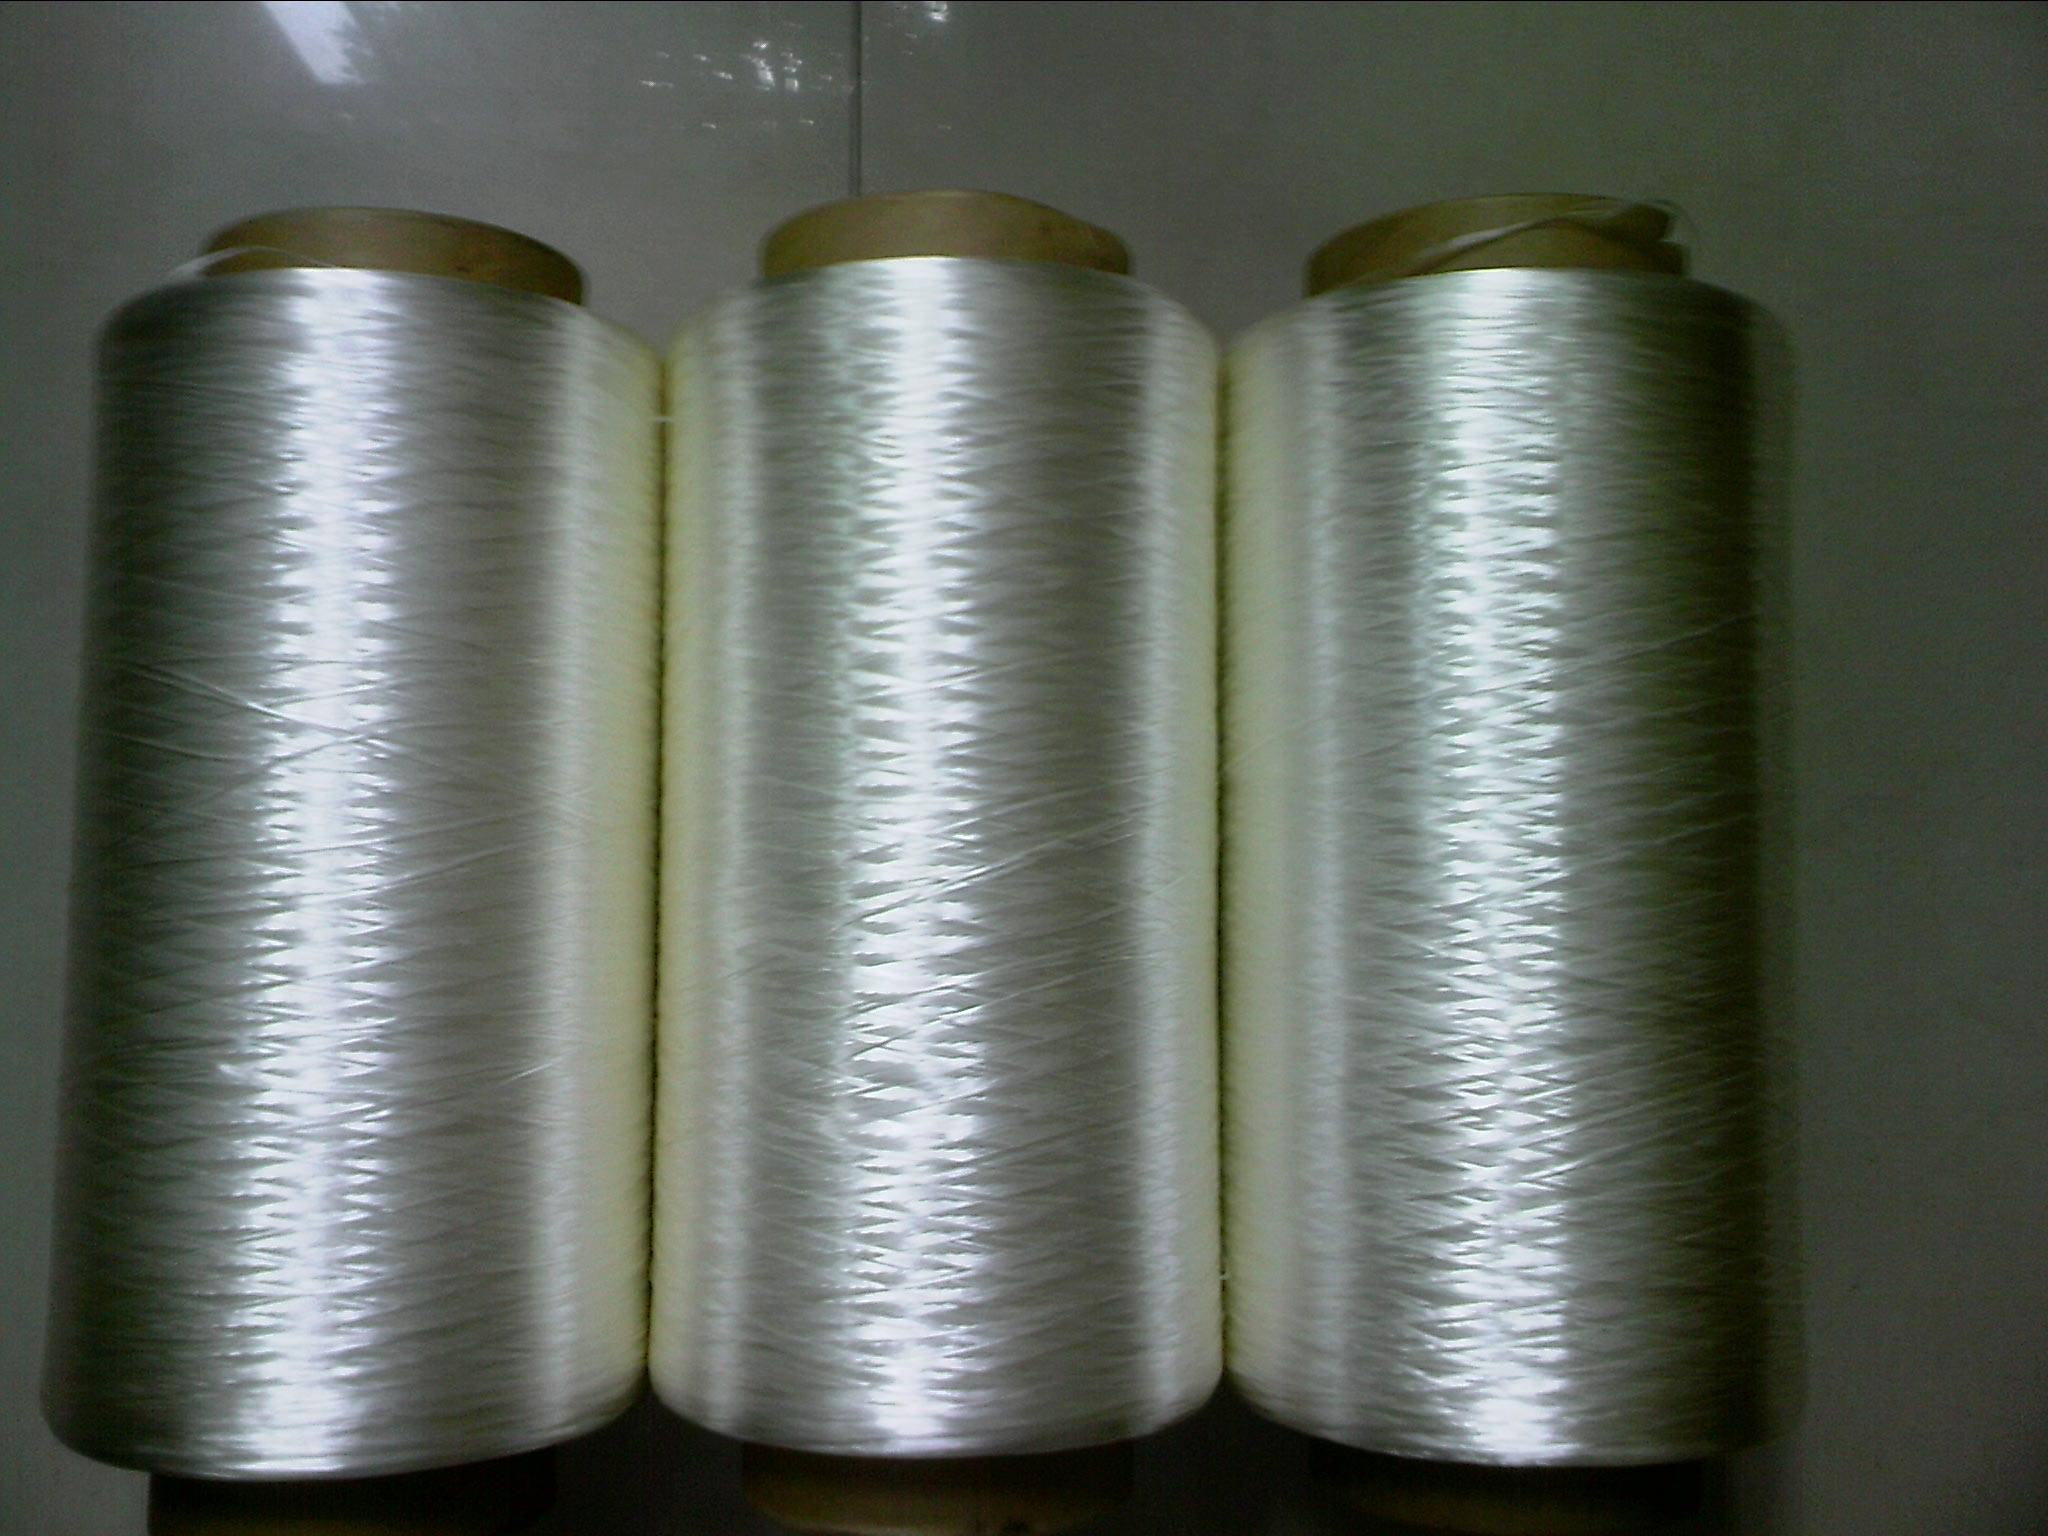 Nylon 6,6 yarn;  Polyamide 6,6 yarn; PA66 filaments